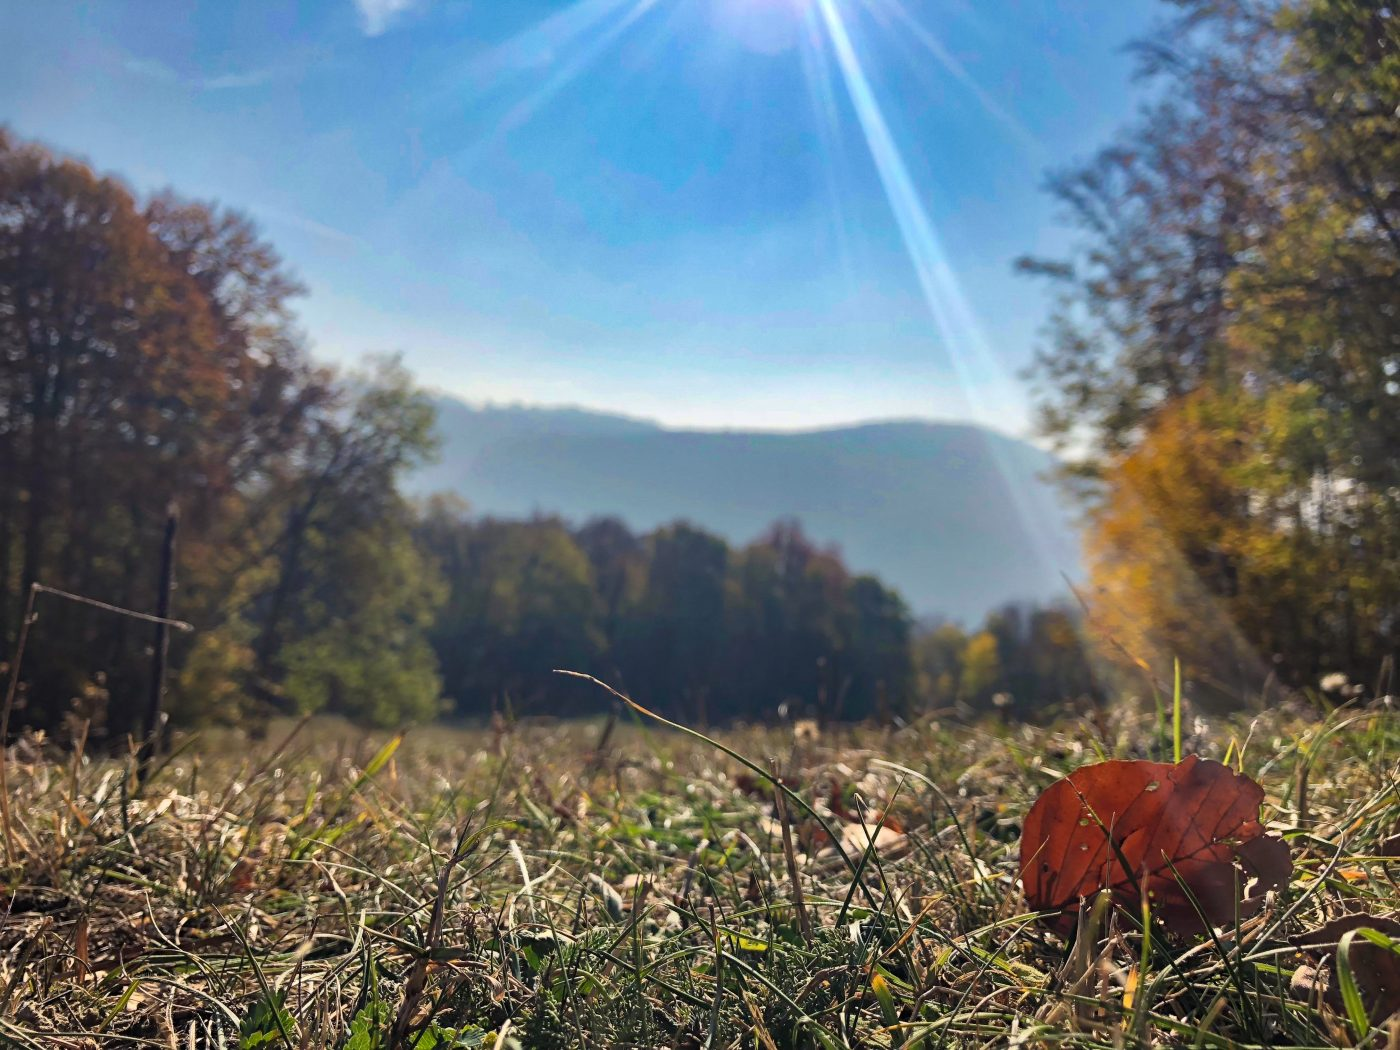 champ automne rando pays horloger doubs jura